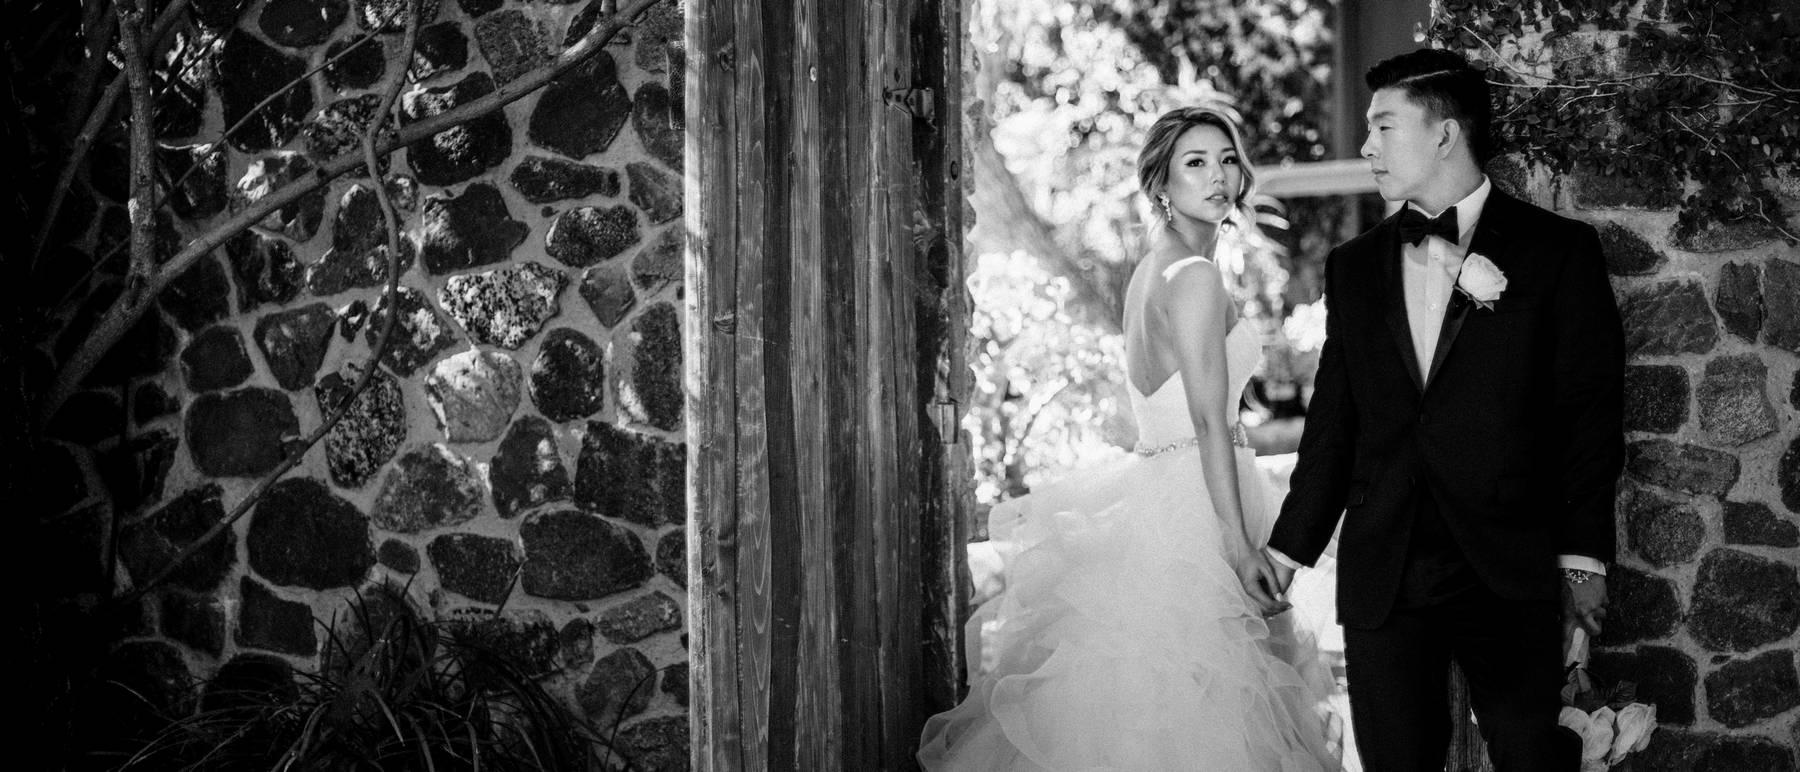 johnandjoseph-wedding-photographer-hz-slider-231